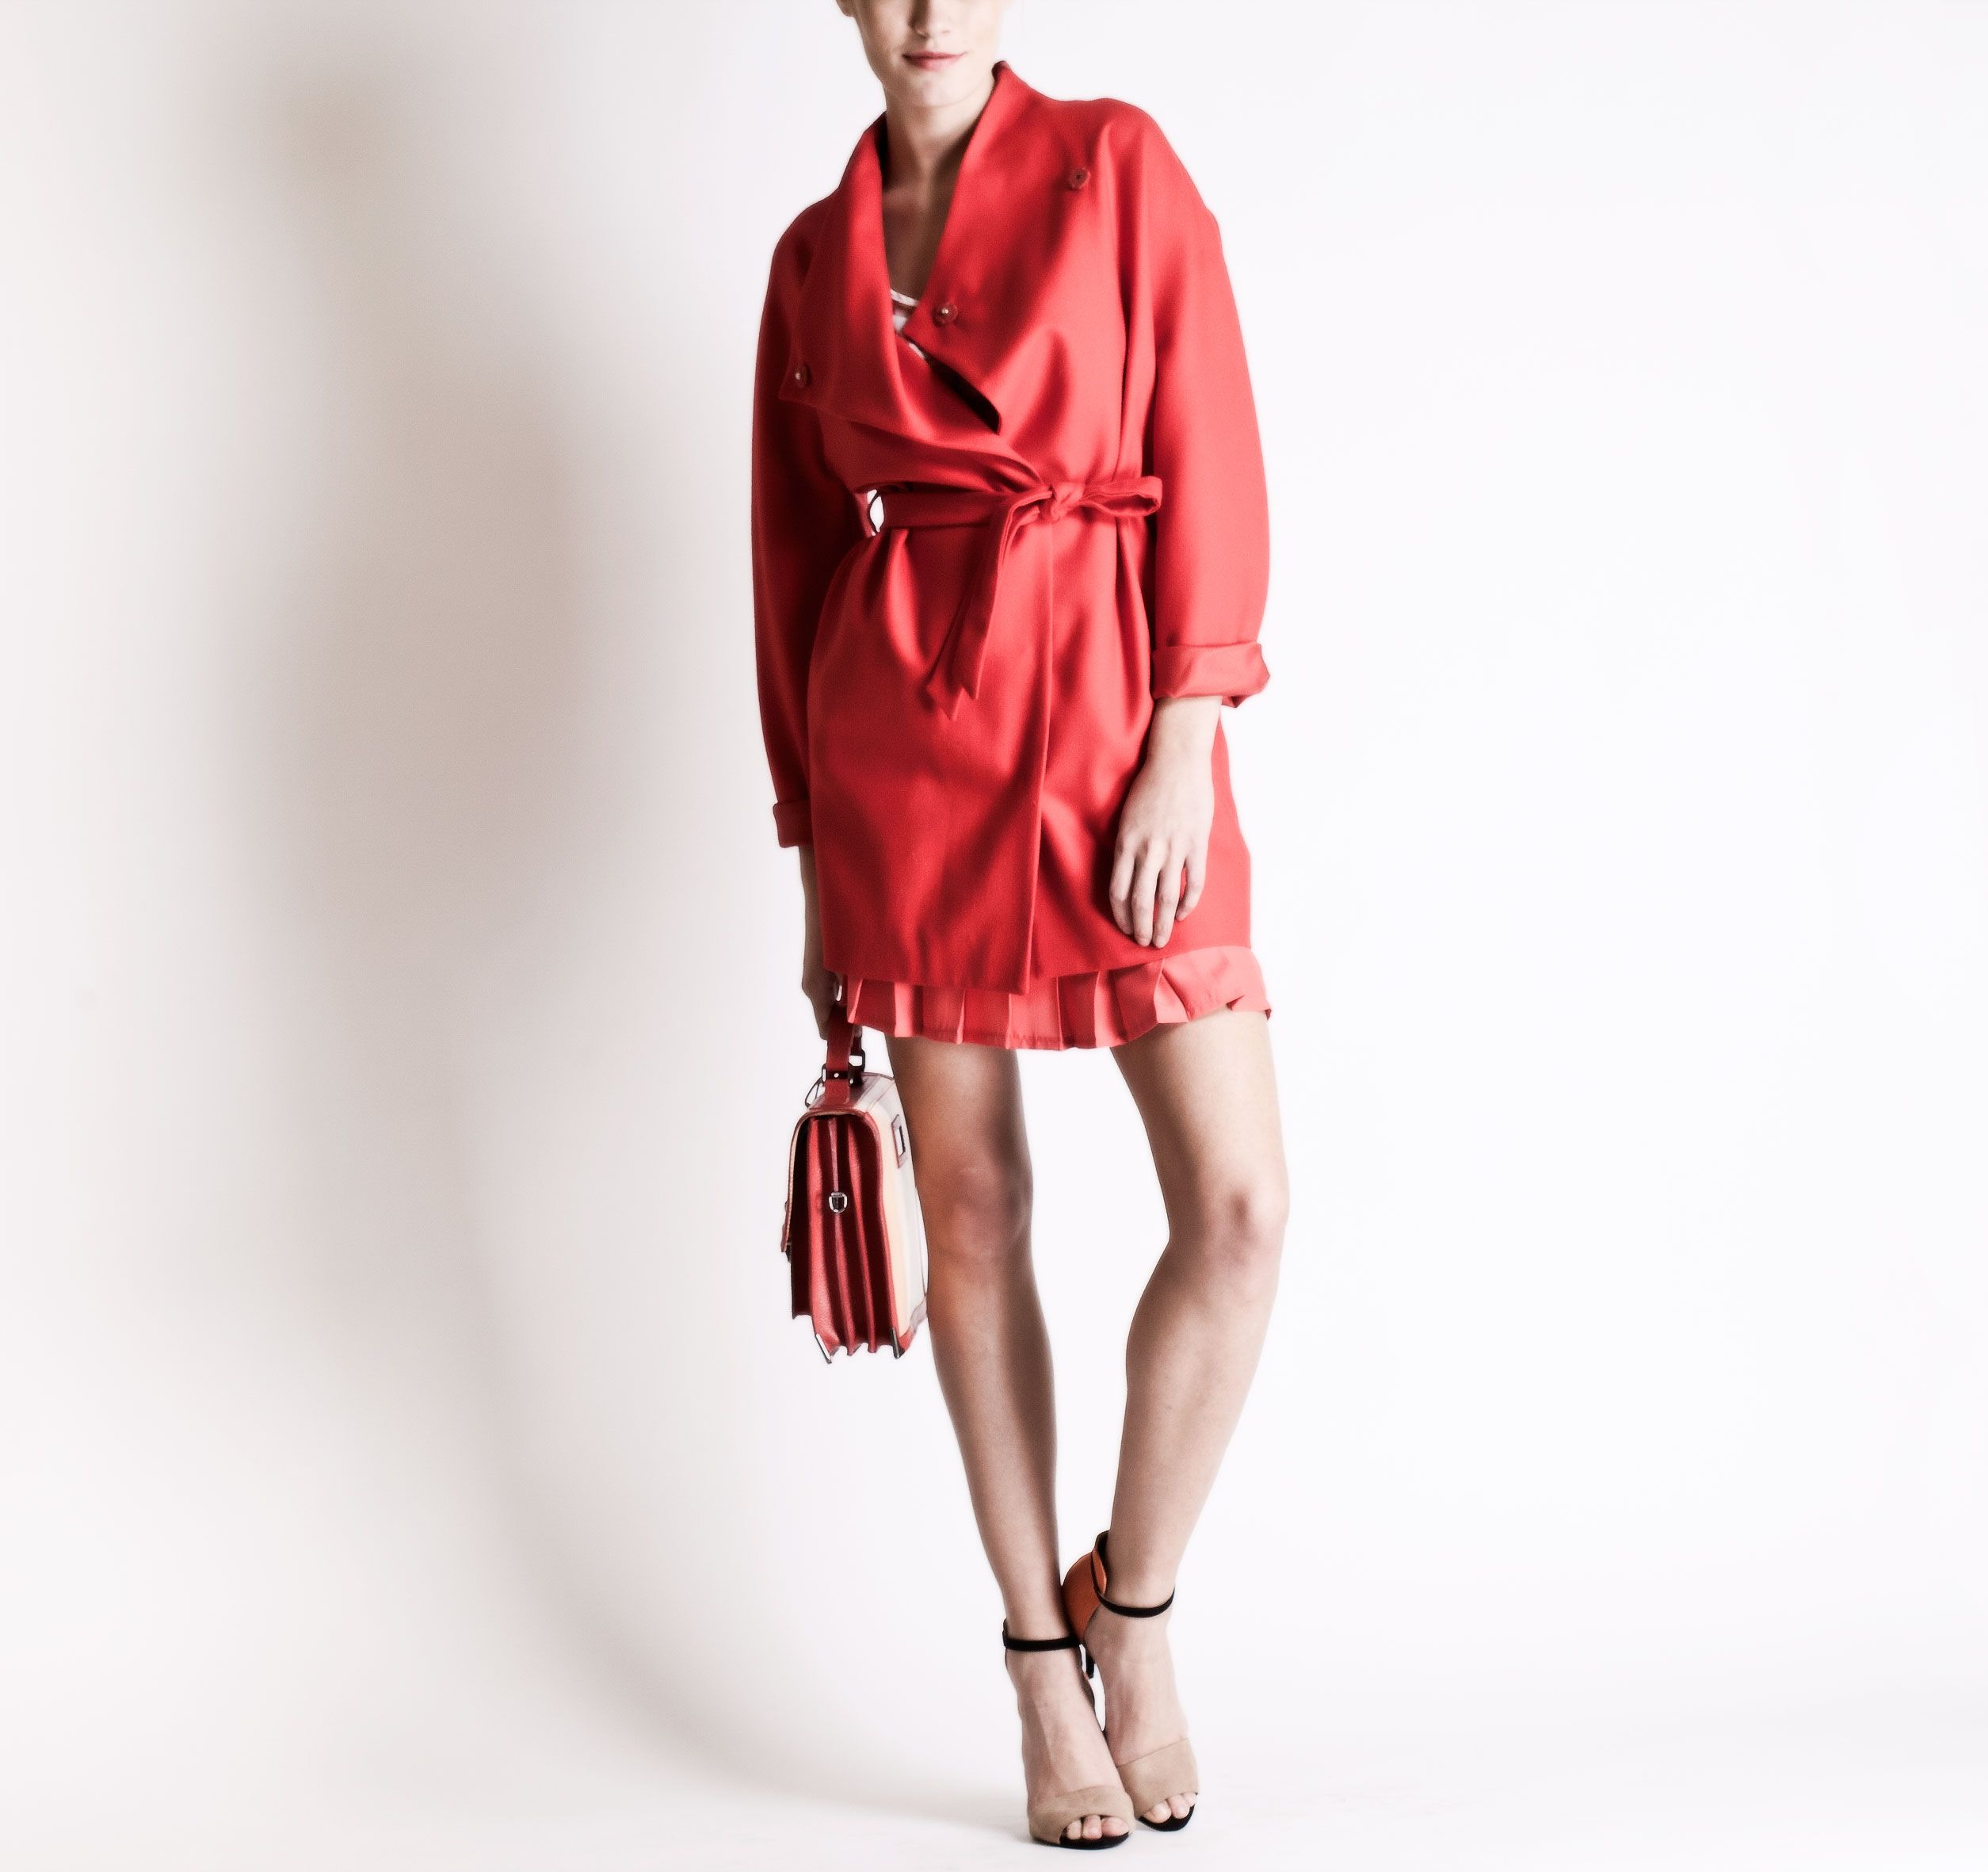 Christine Phung SS2013 Ara Red Coat #ModeWalk #luxury #fashion #ChristinePhung #coat